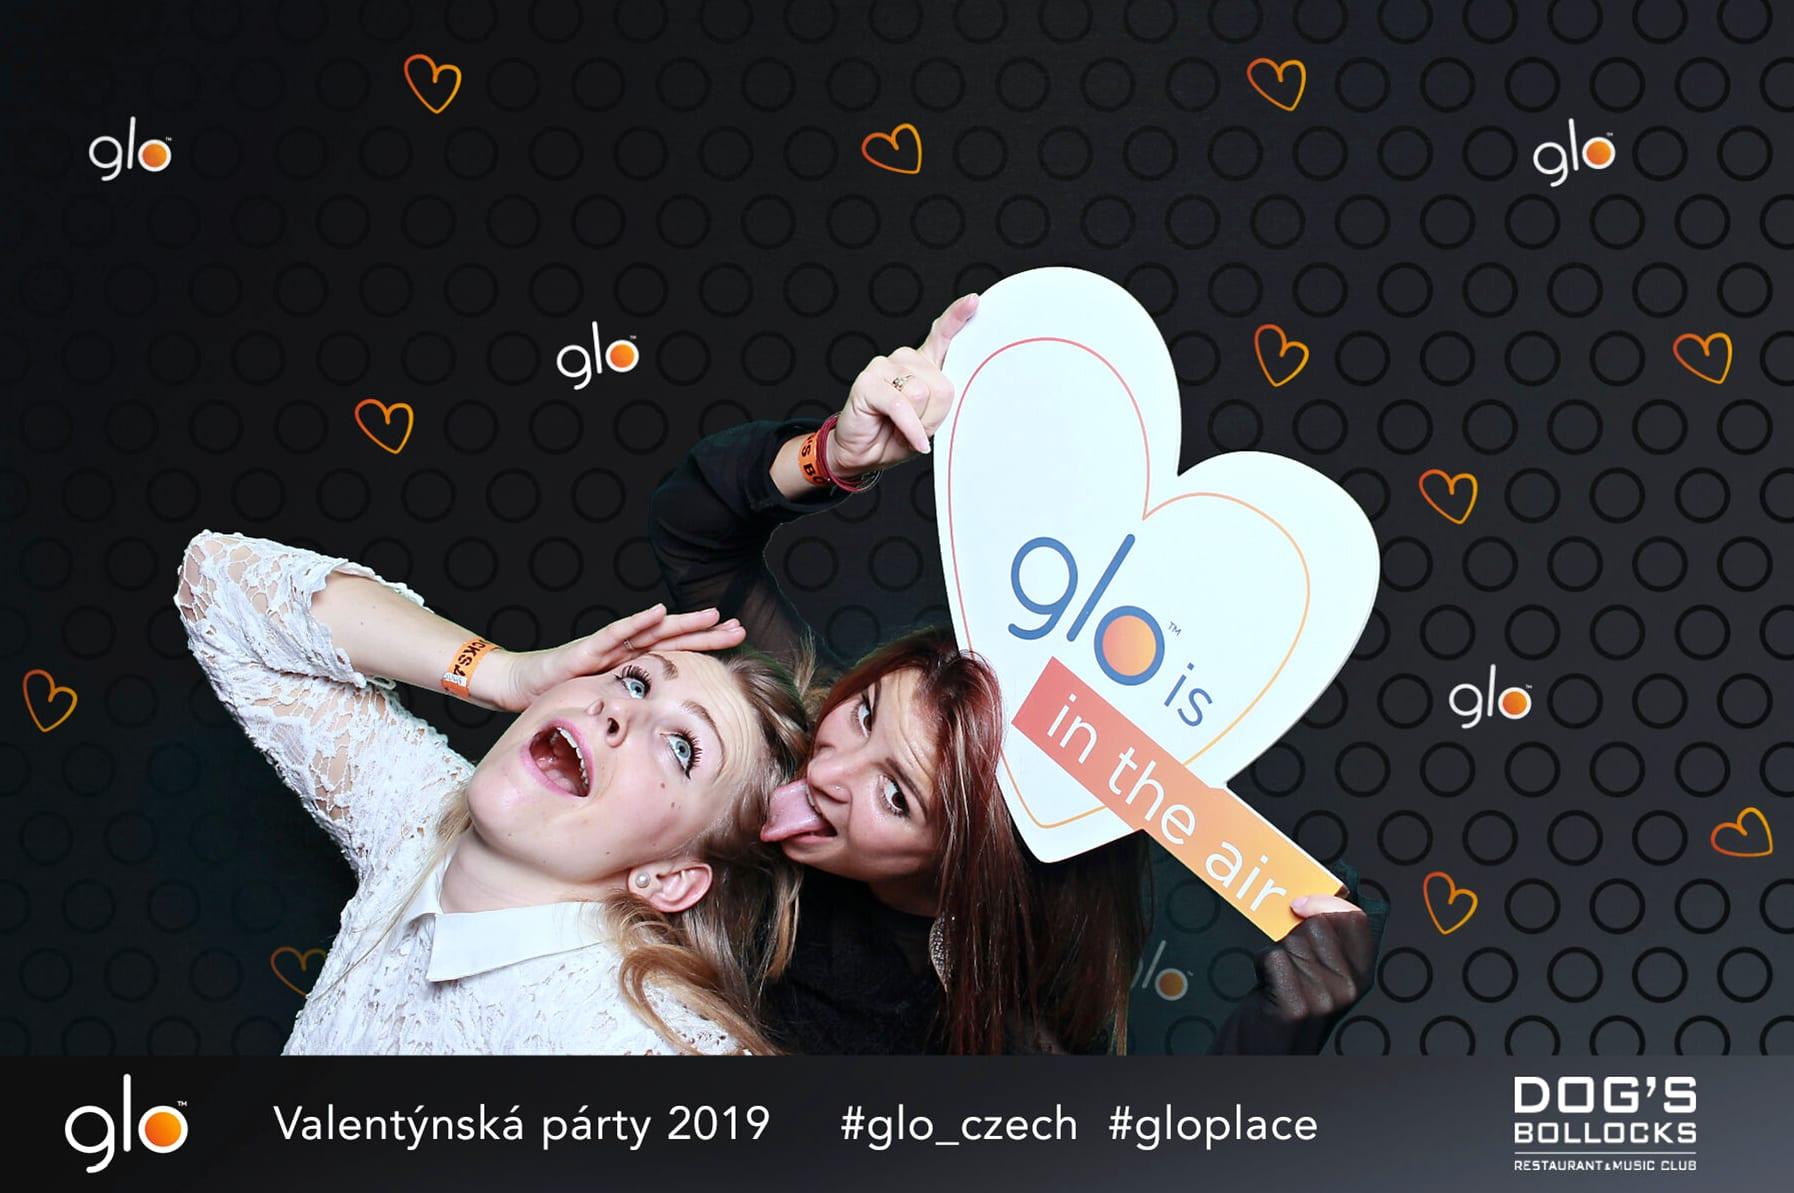 fotokoutek-glo-dogs-bollocks-15-2-2019-580730